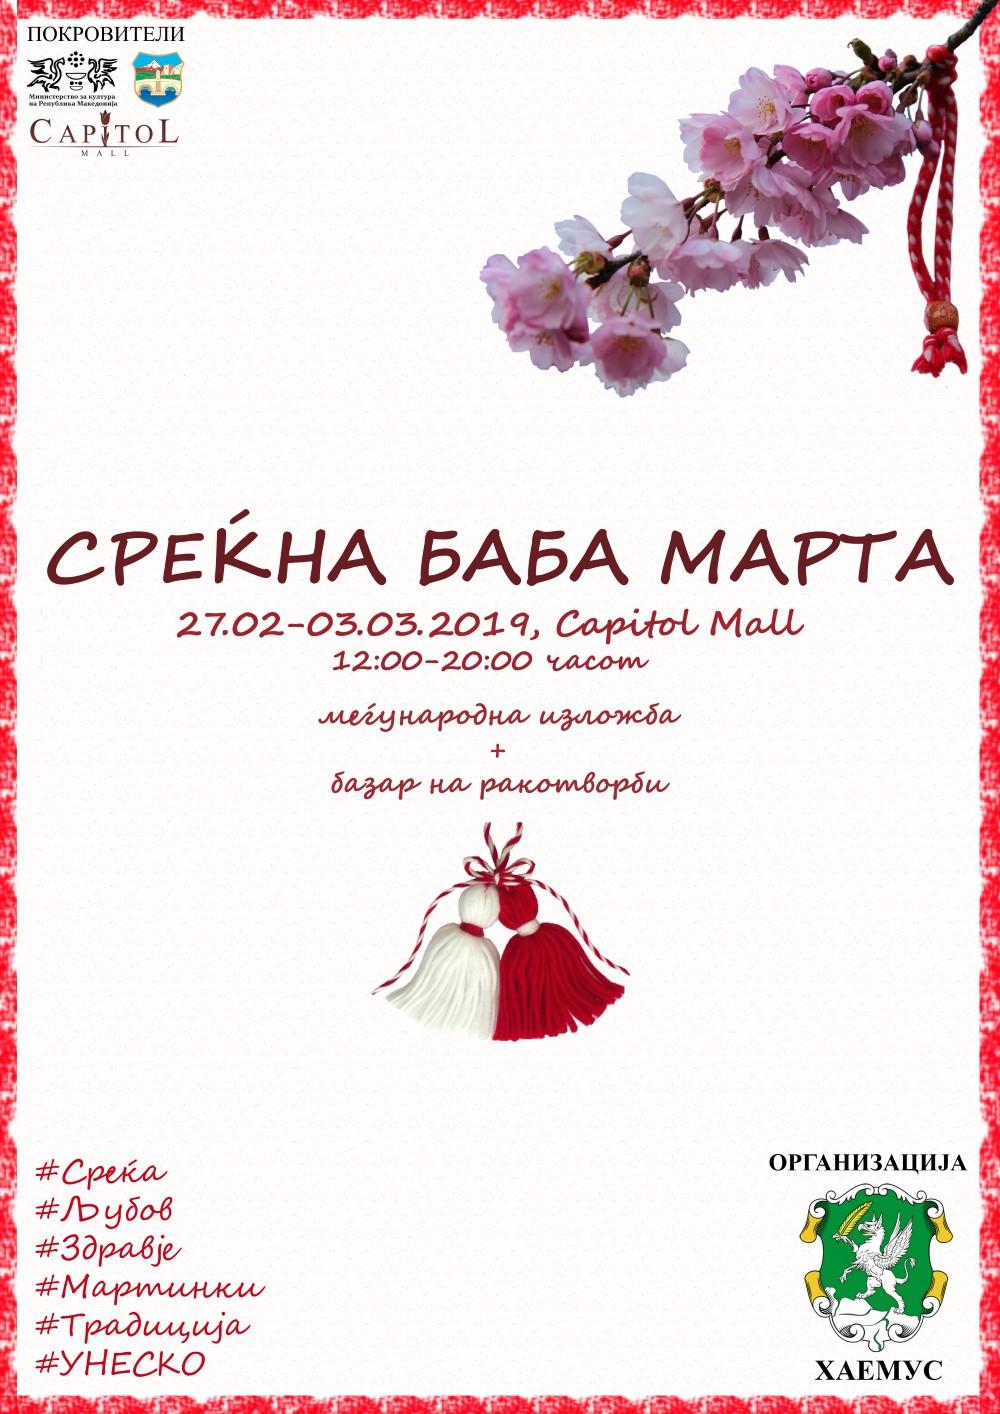 Martinki_Exhibition_HAEMUS_2019